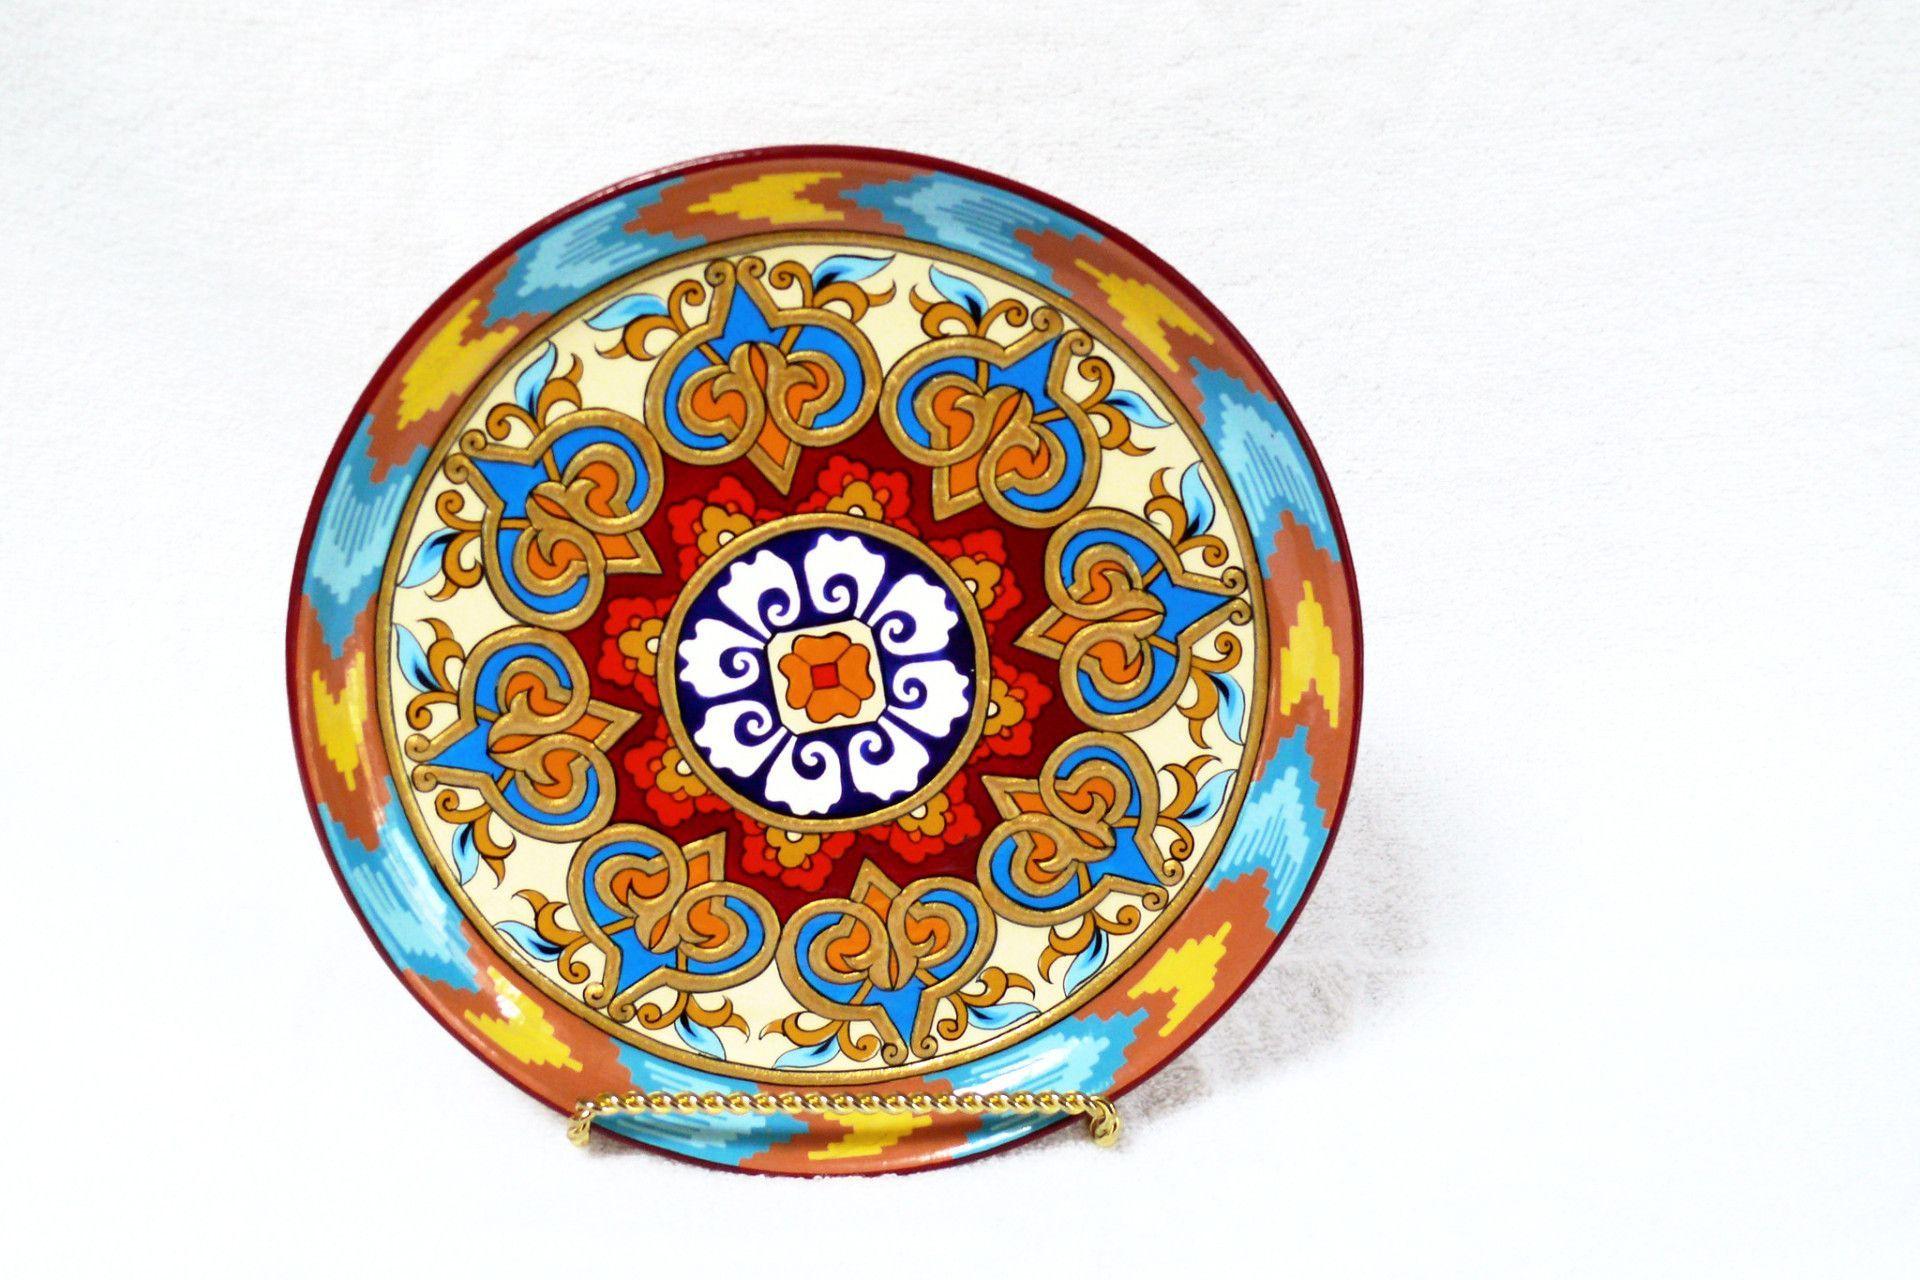 Large Decorative Ceramic Plates Kundal Painting Round Ceramic Plate Decorative Fair Trade